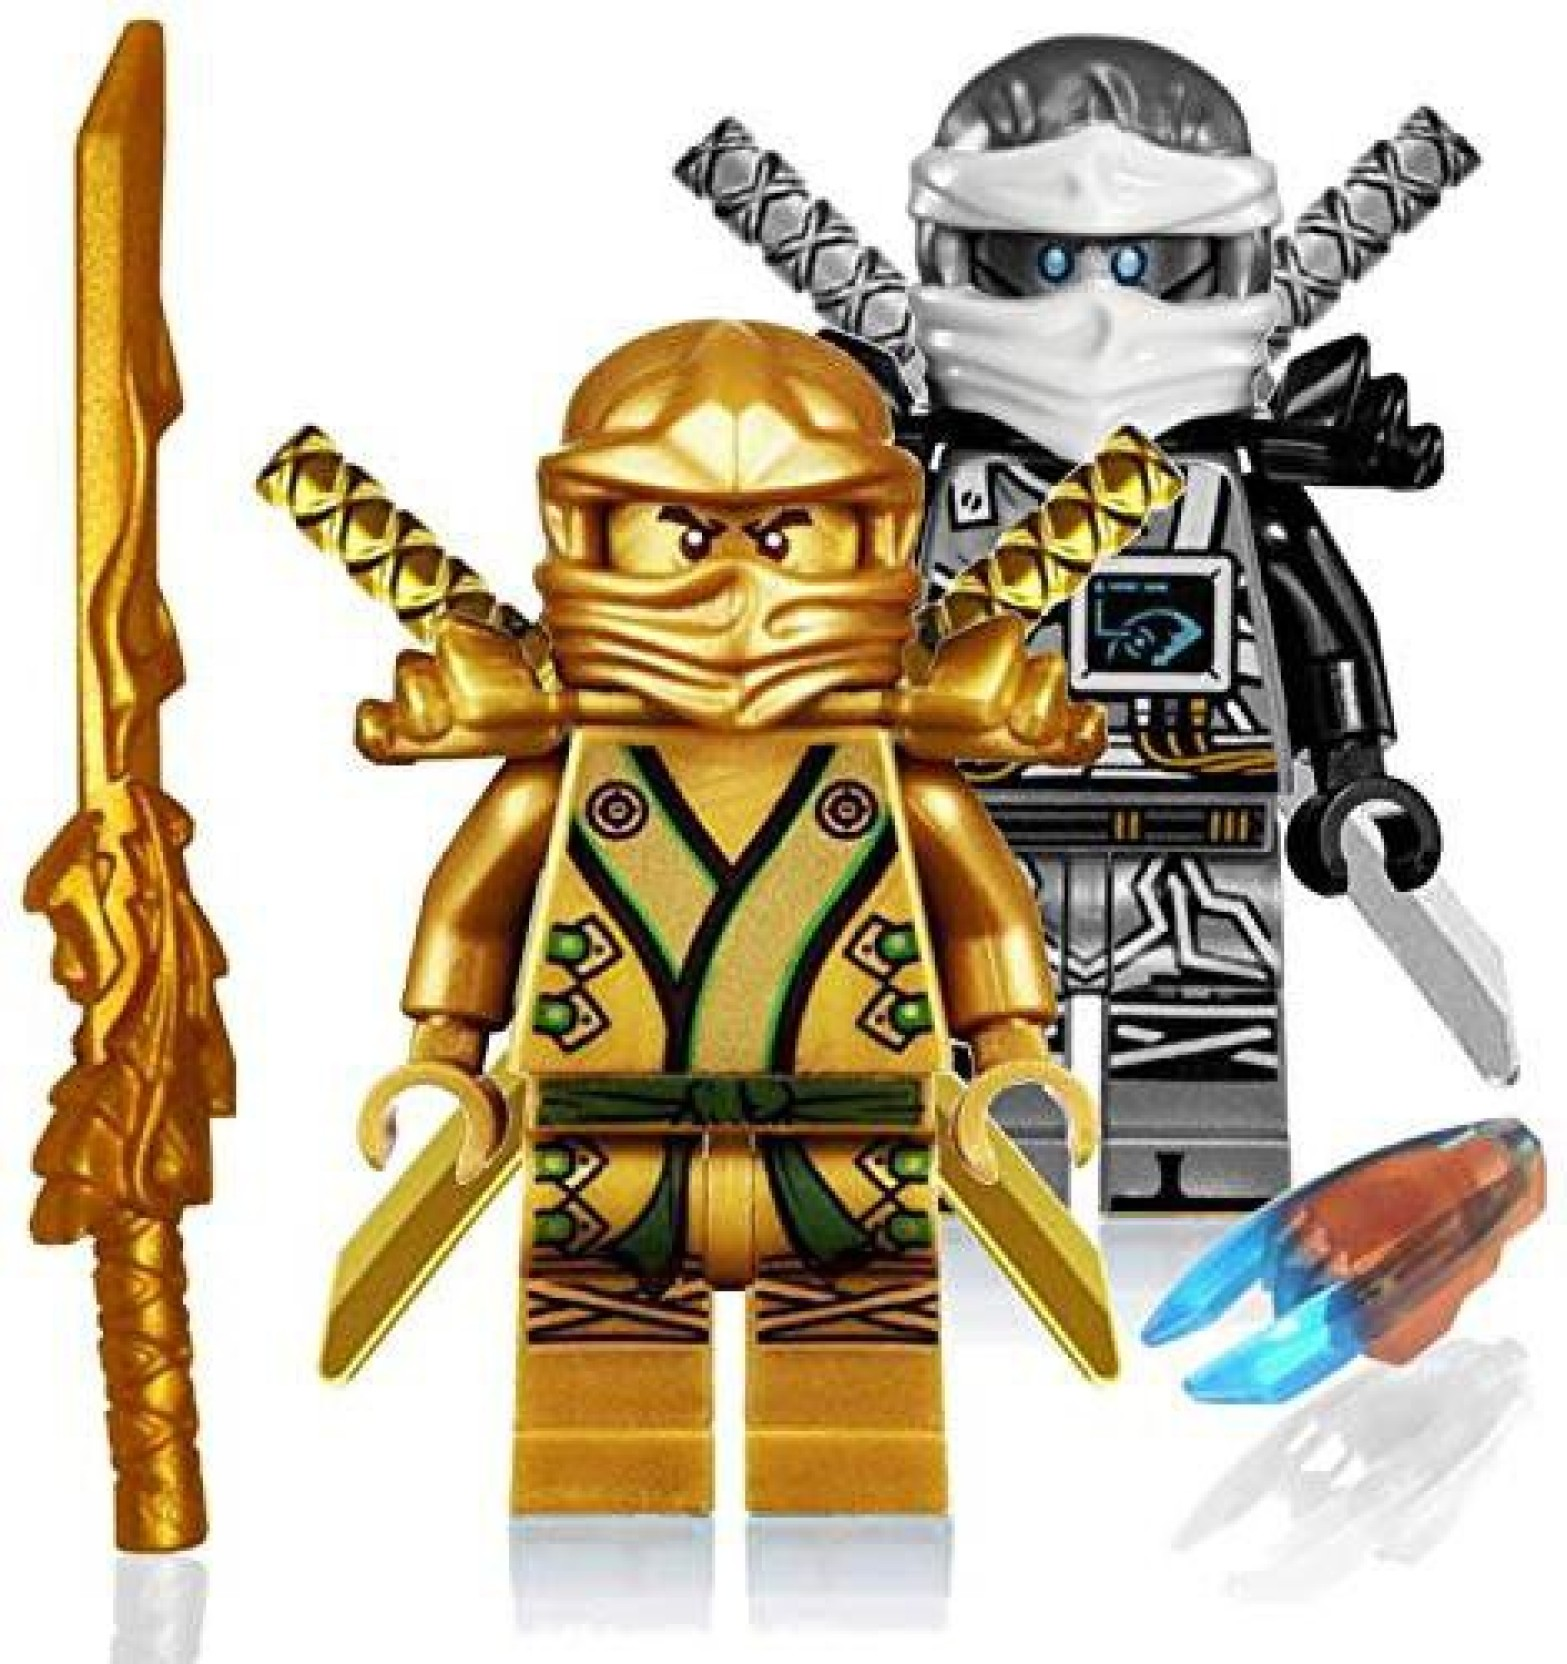 Lego Ninjago Original Blue Jay Minifigure With Gold Dragon Sword Weapon New